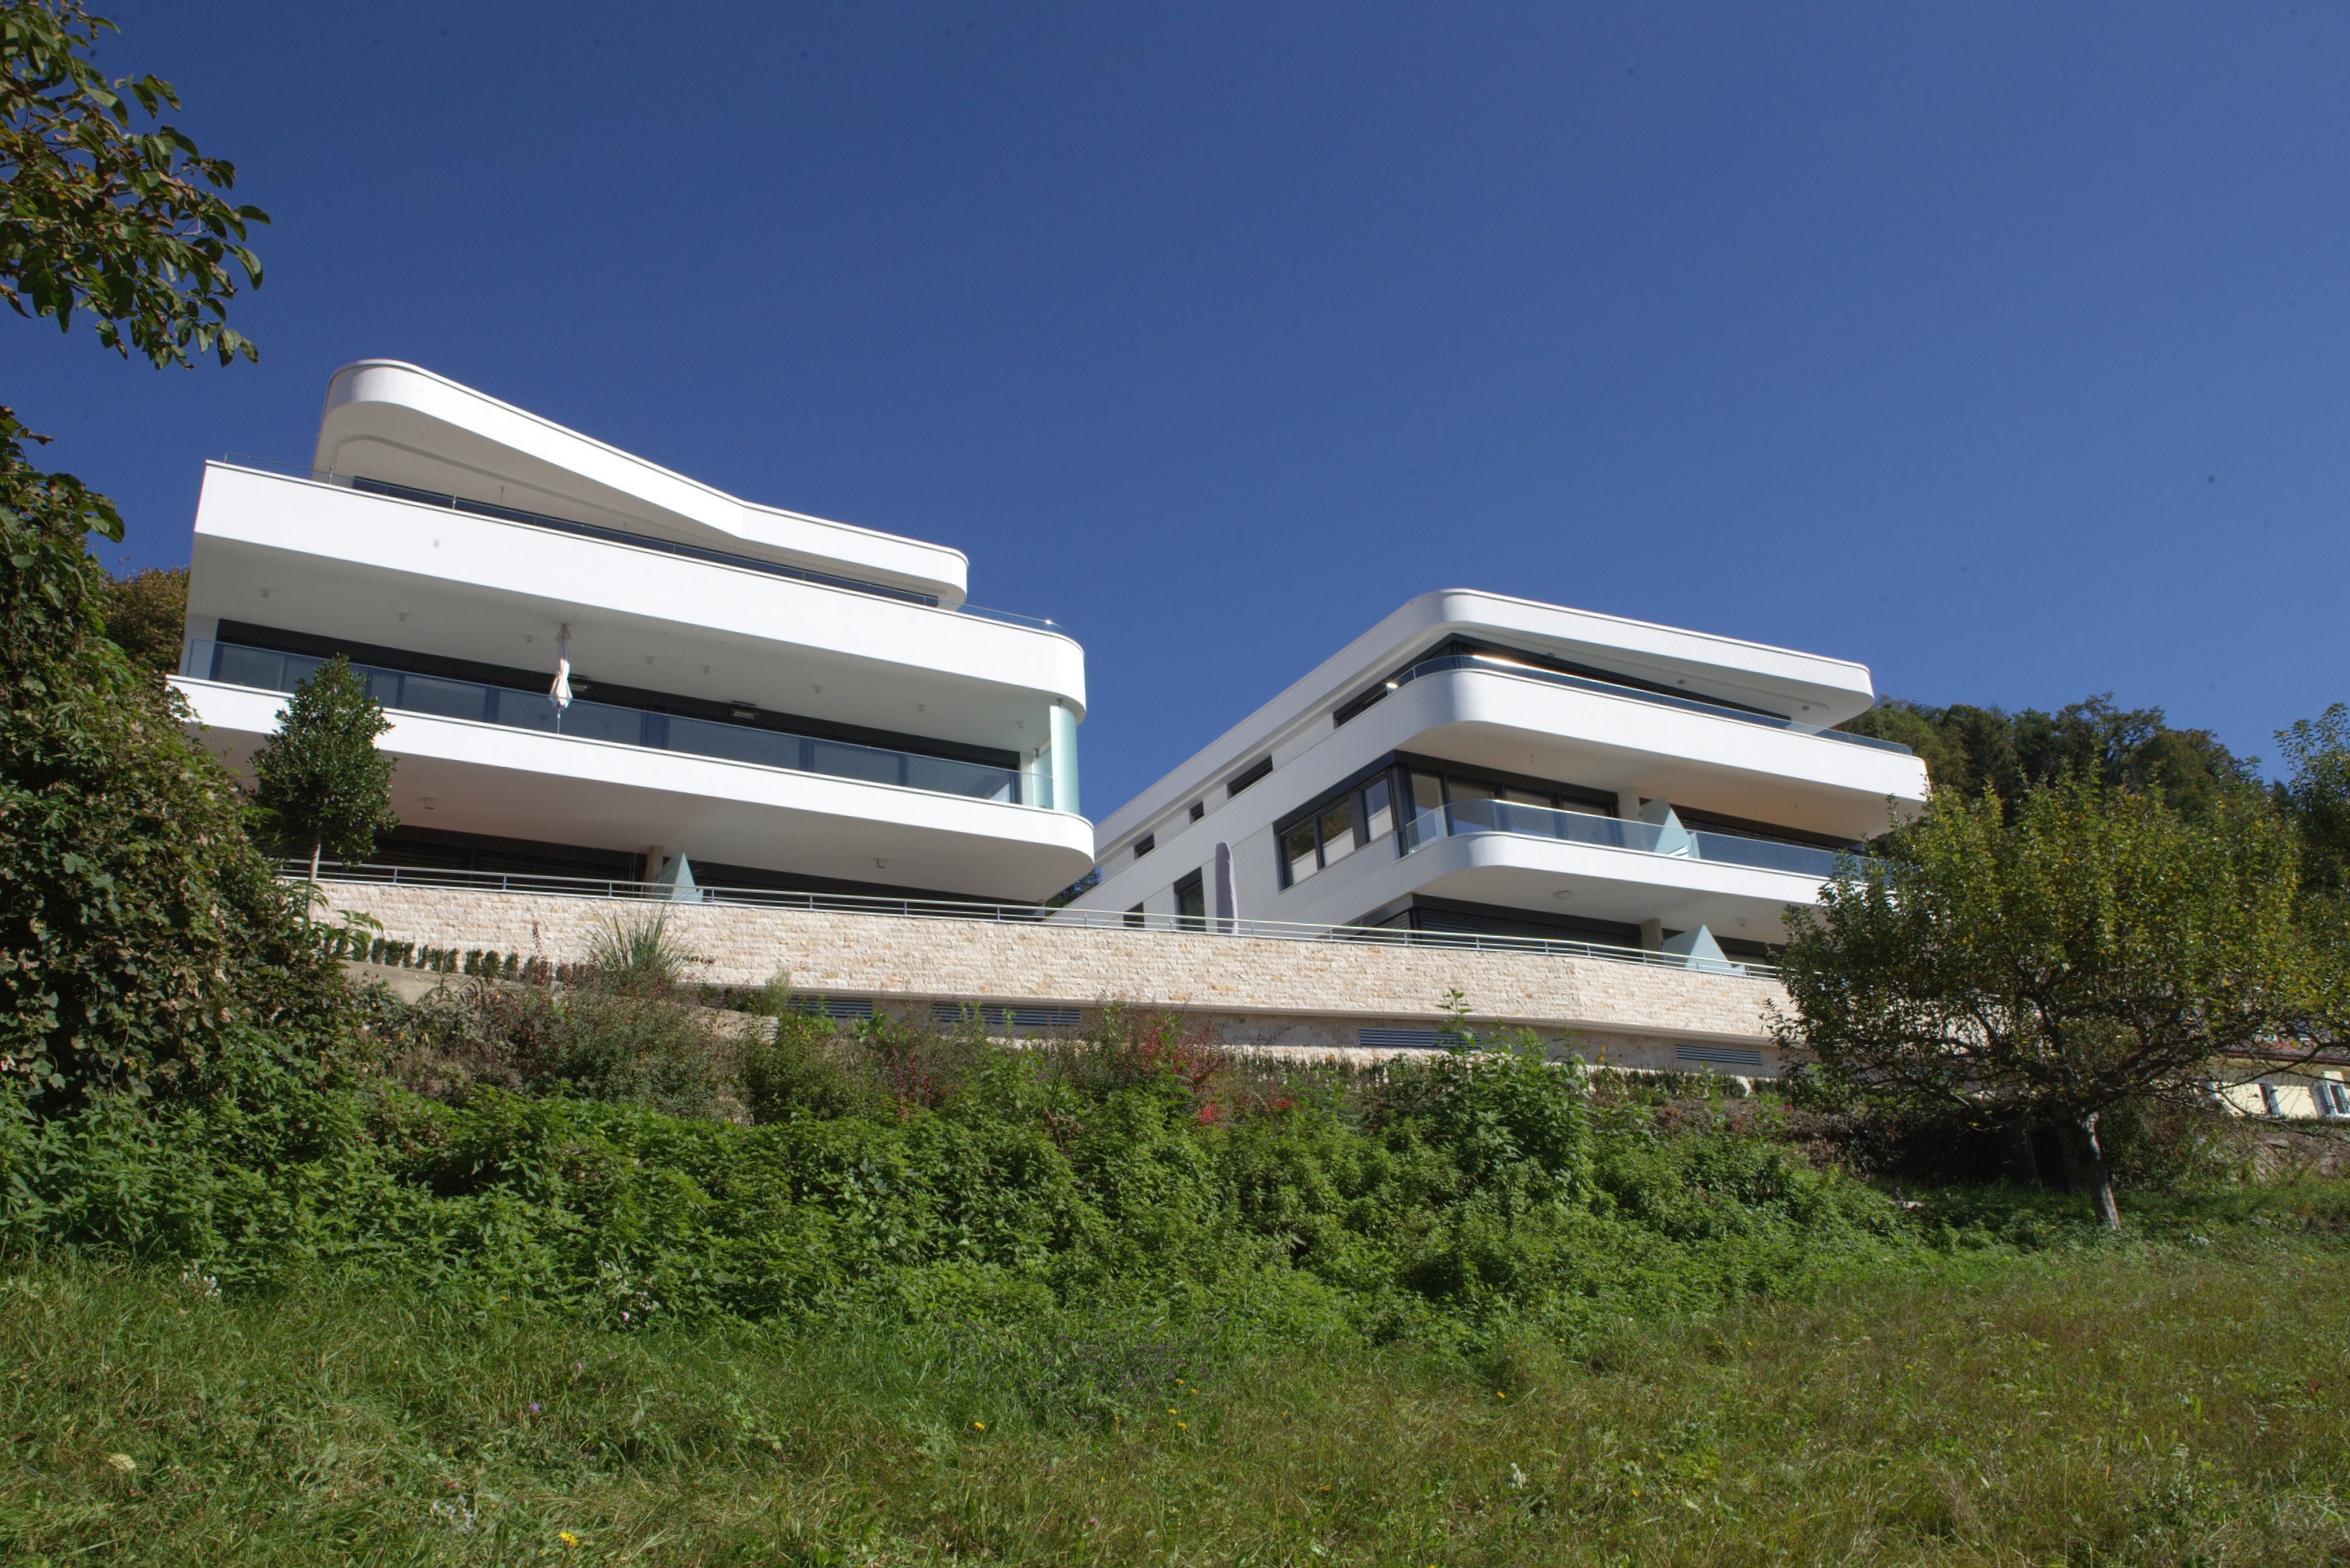 A01 architects - The Millstatt_(c) Nadine Blanchard__web04.jpg